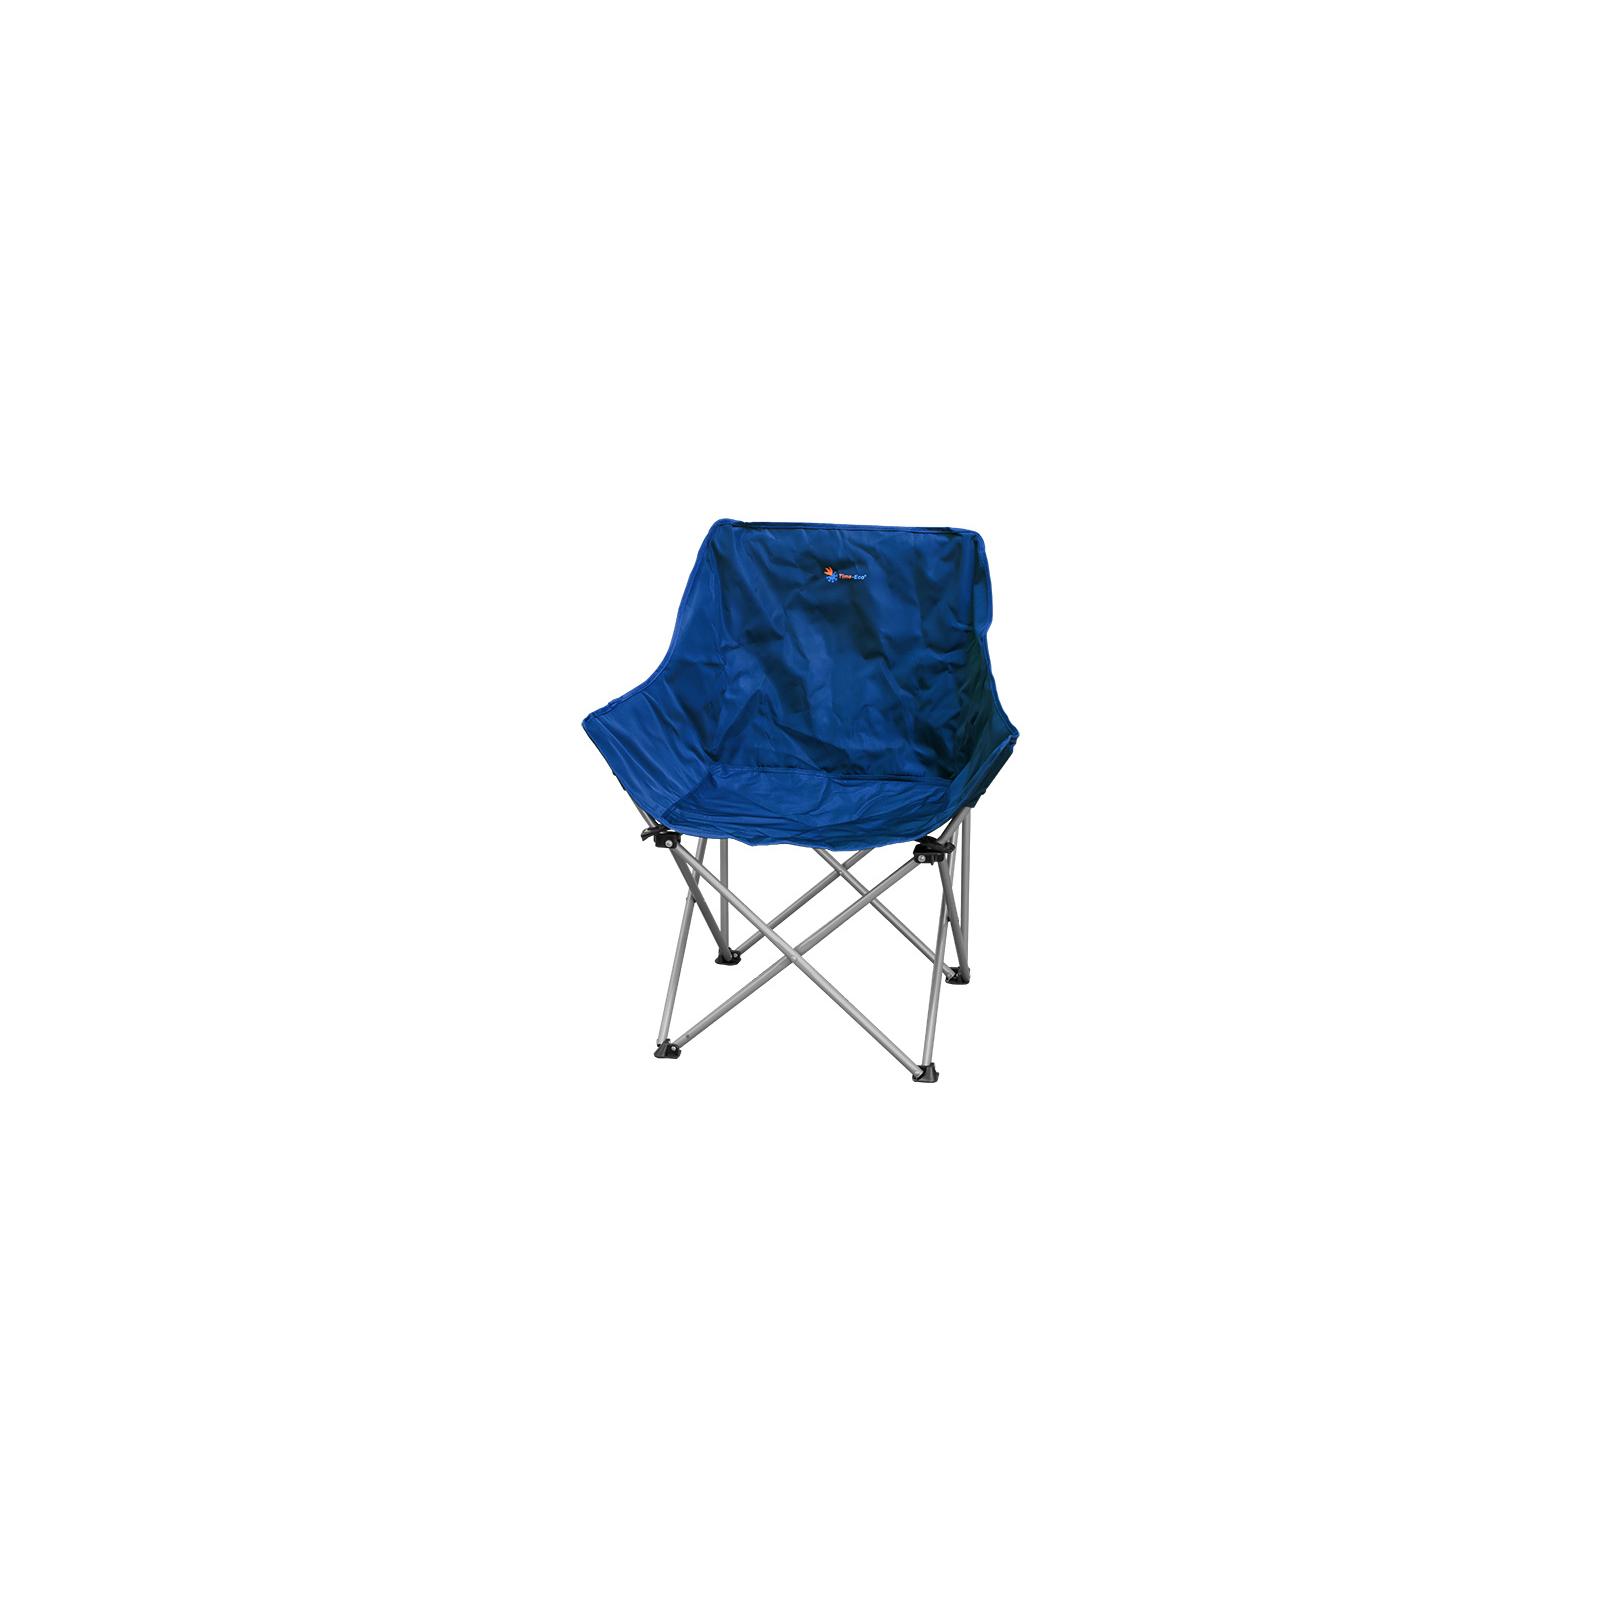 Кресло складное Time Eco TE-30 SD-140 (30 SD-140)